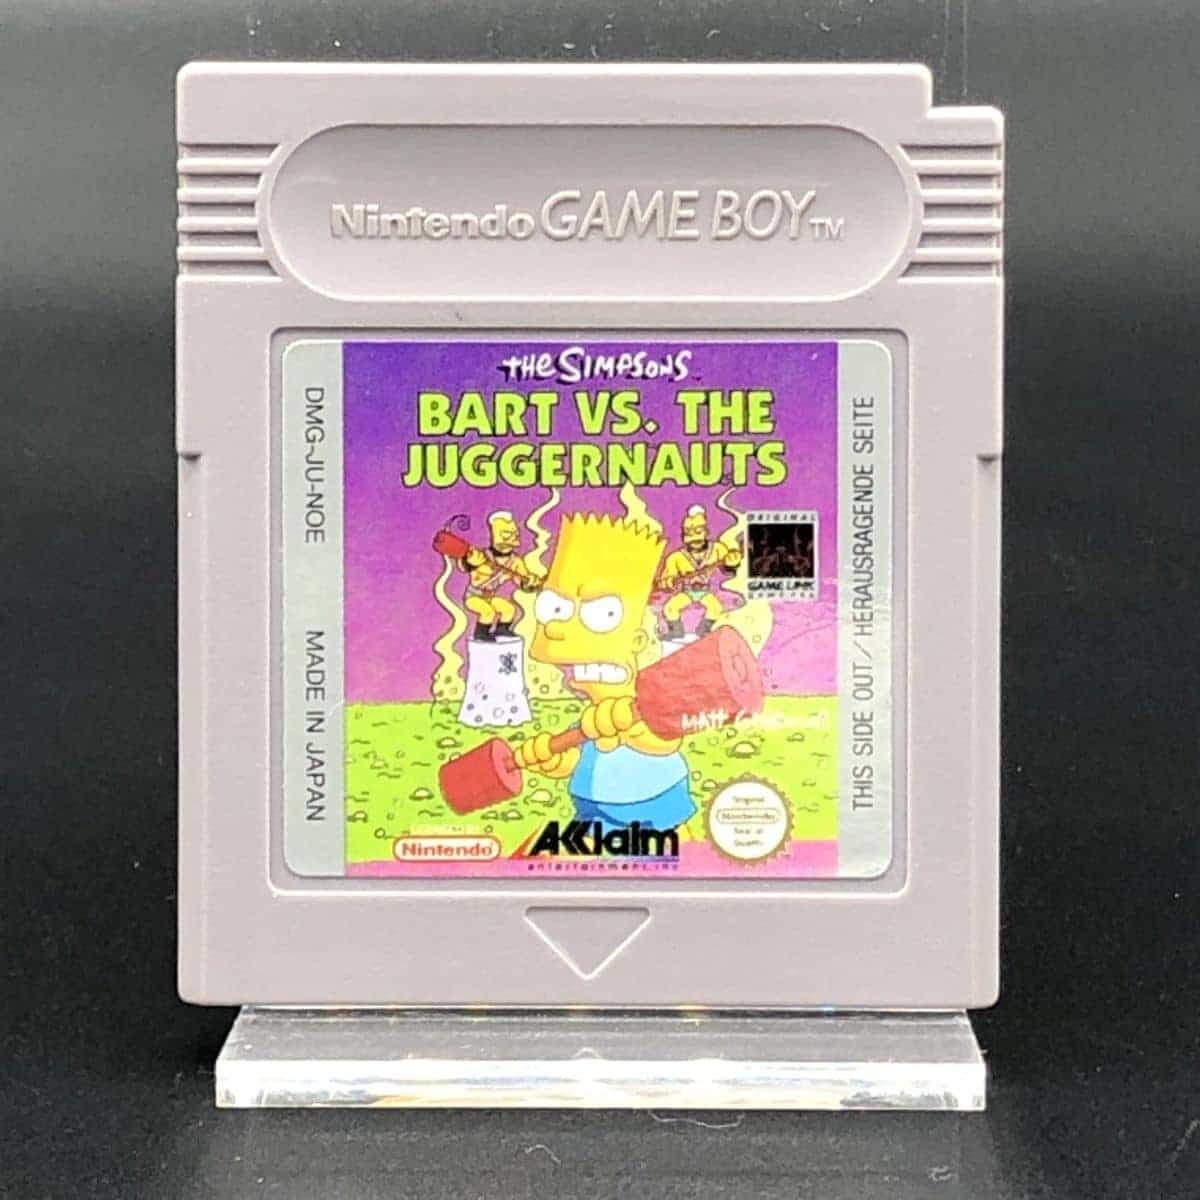 GB The Simpsons: Bart vs. The Juggernauts (Modul) (Sehr gut) Nintendo Game Boy